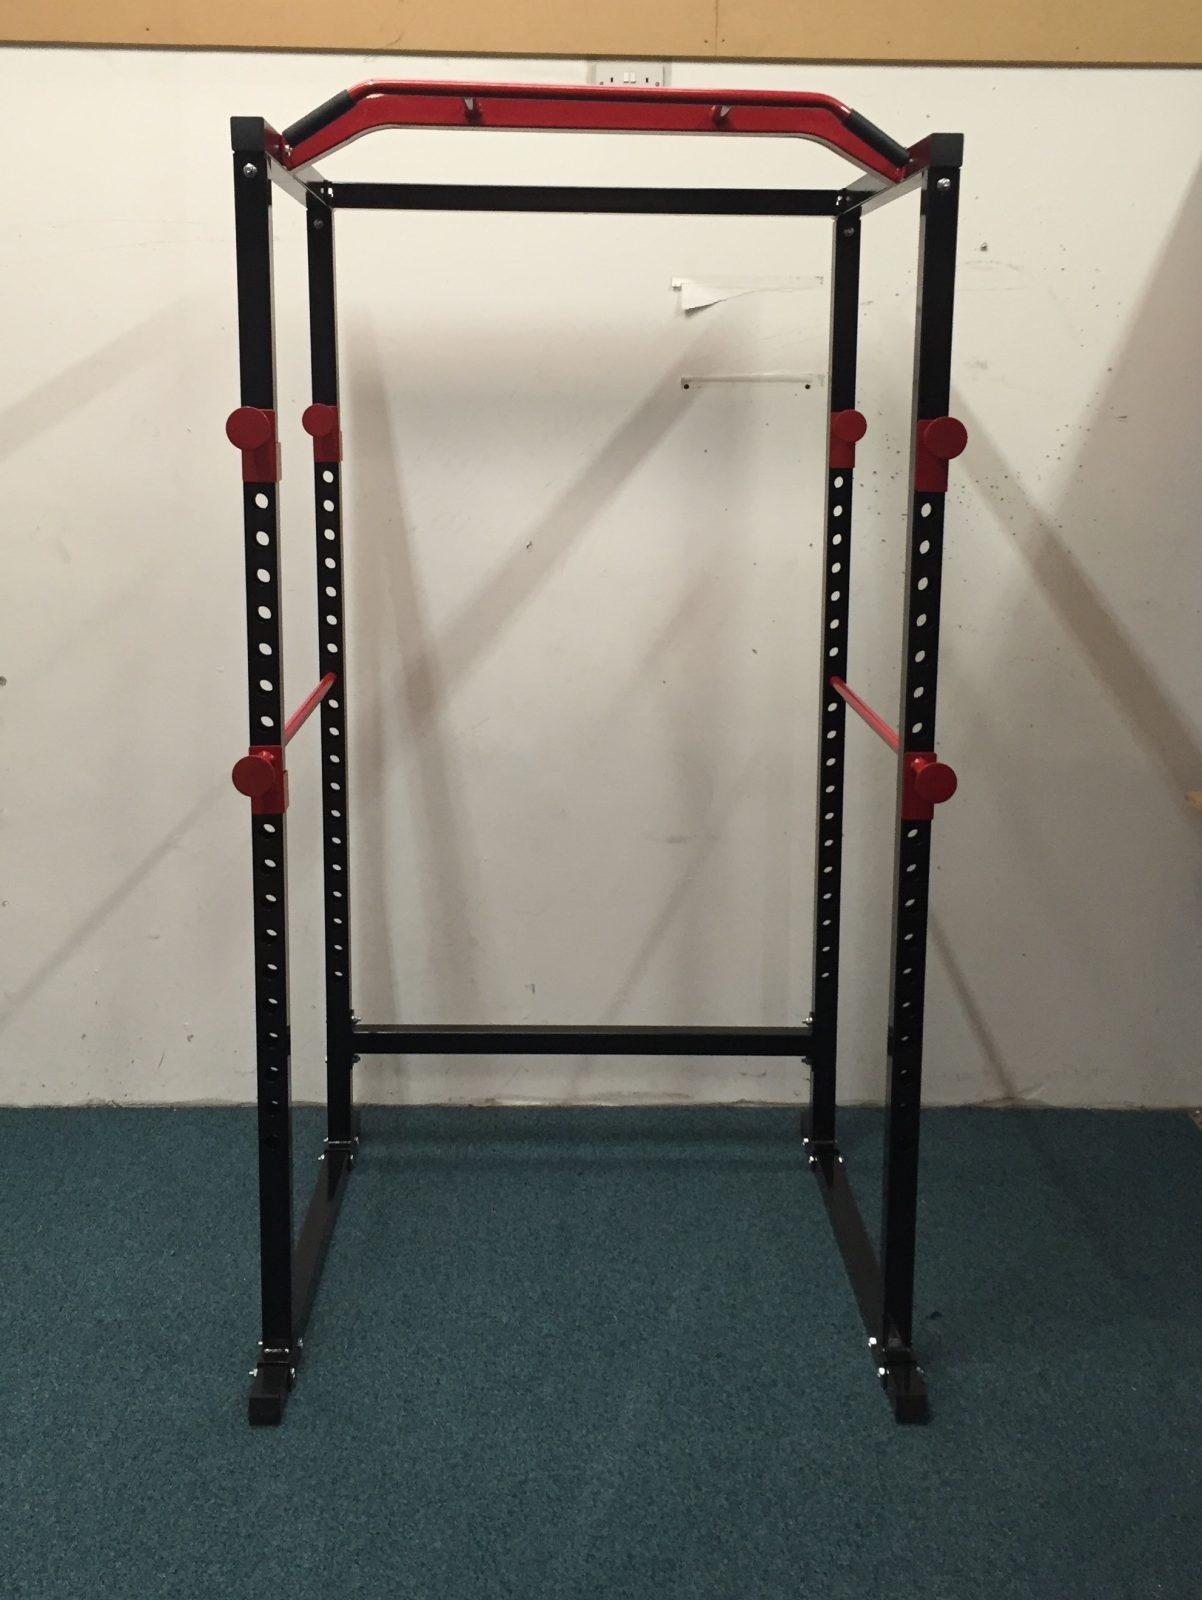 Power Rack Power Cage Fitness Equipment Ireland Best